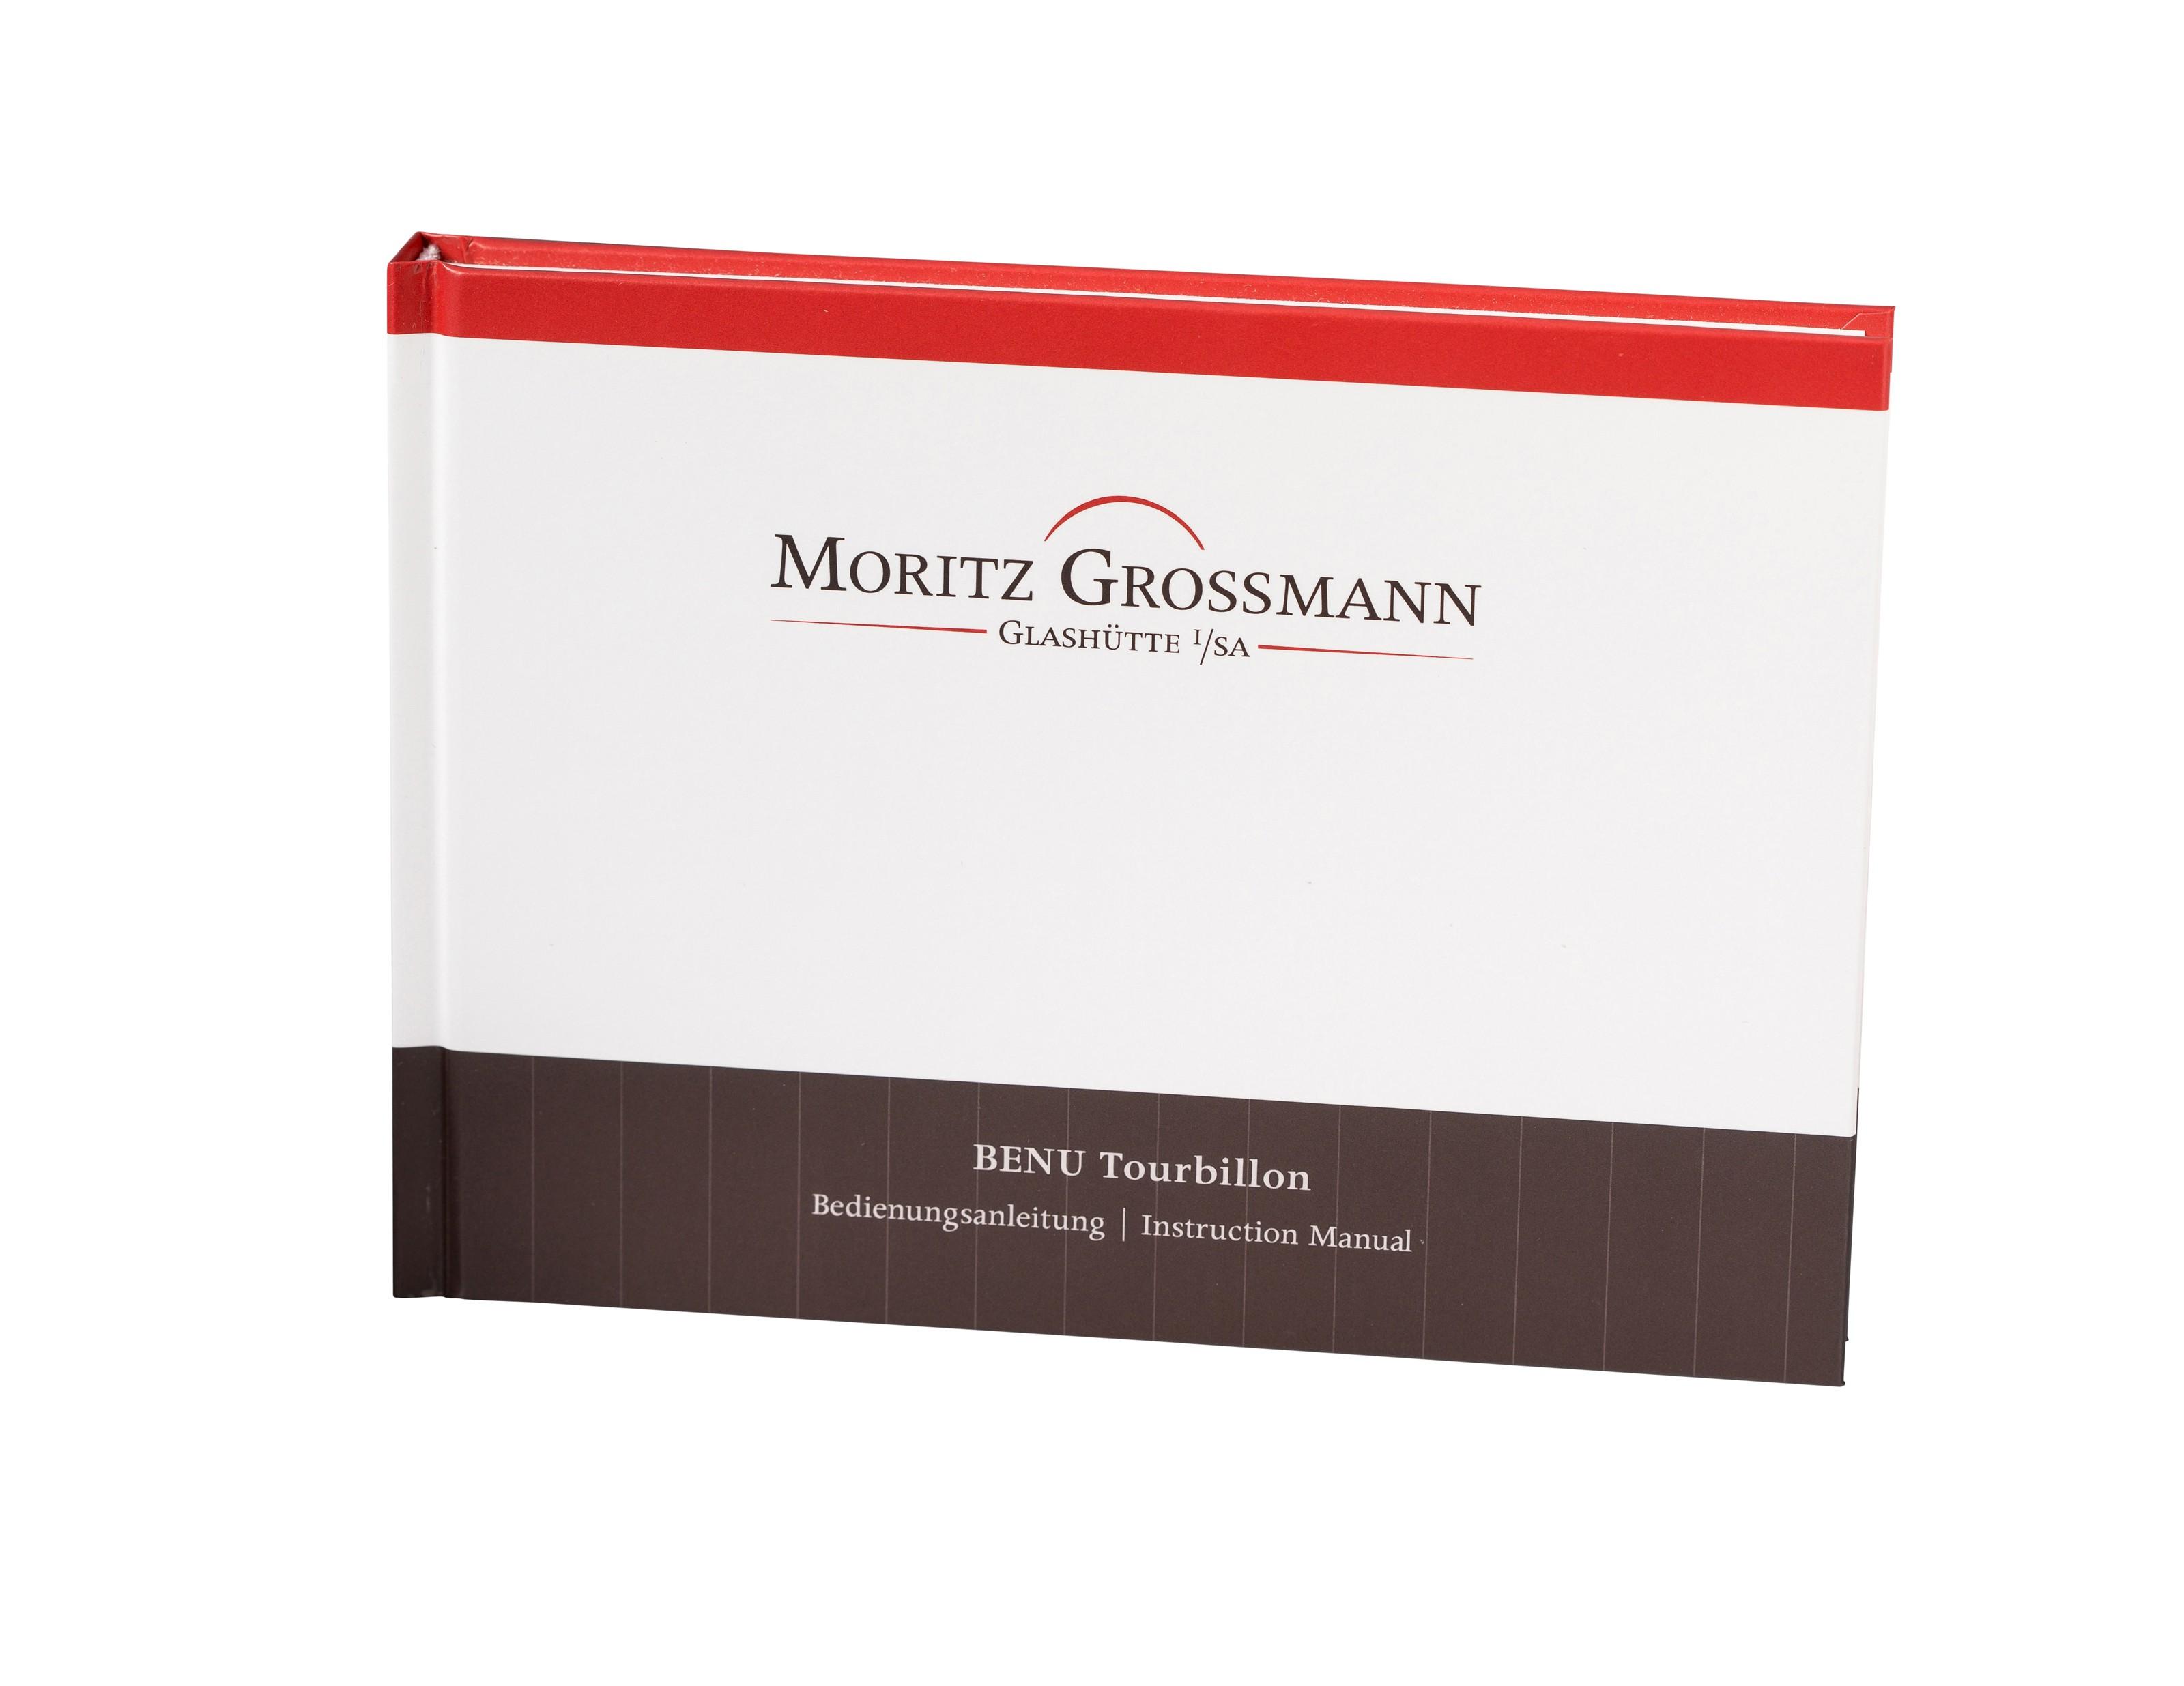 MORITZ GROSSMANN, BENU TOURBILLON ORANGE TITANIUM, MG-002066